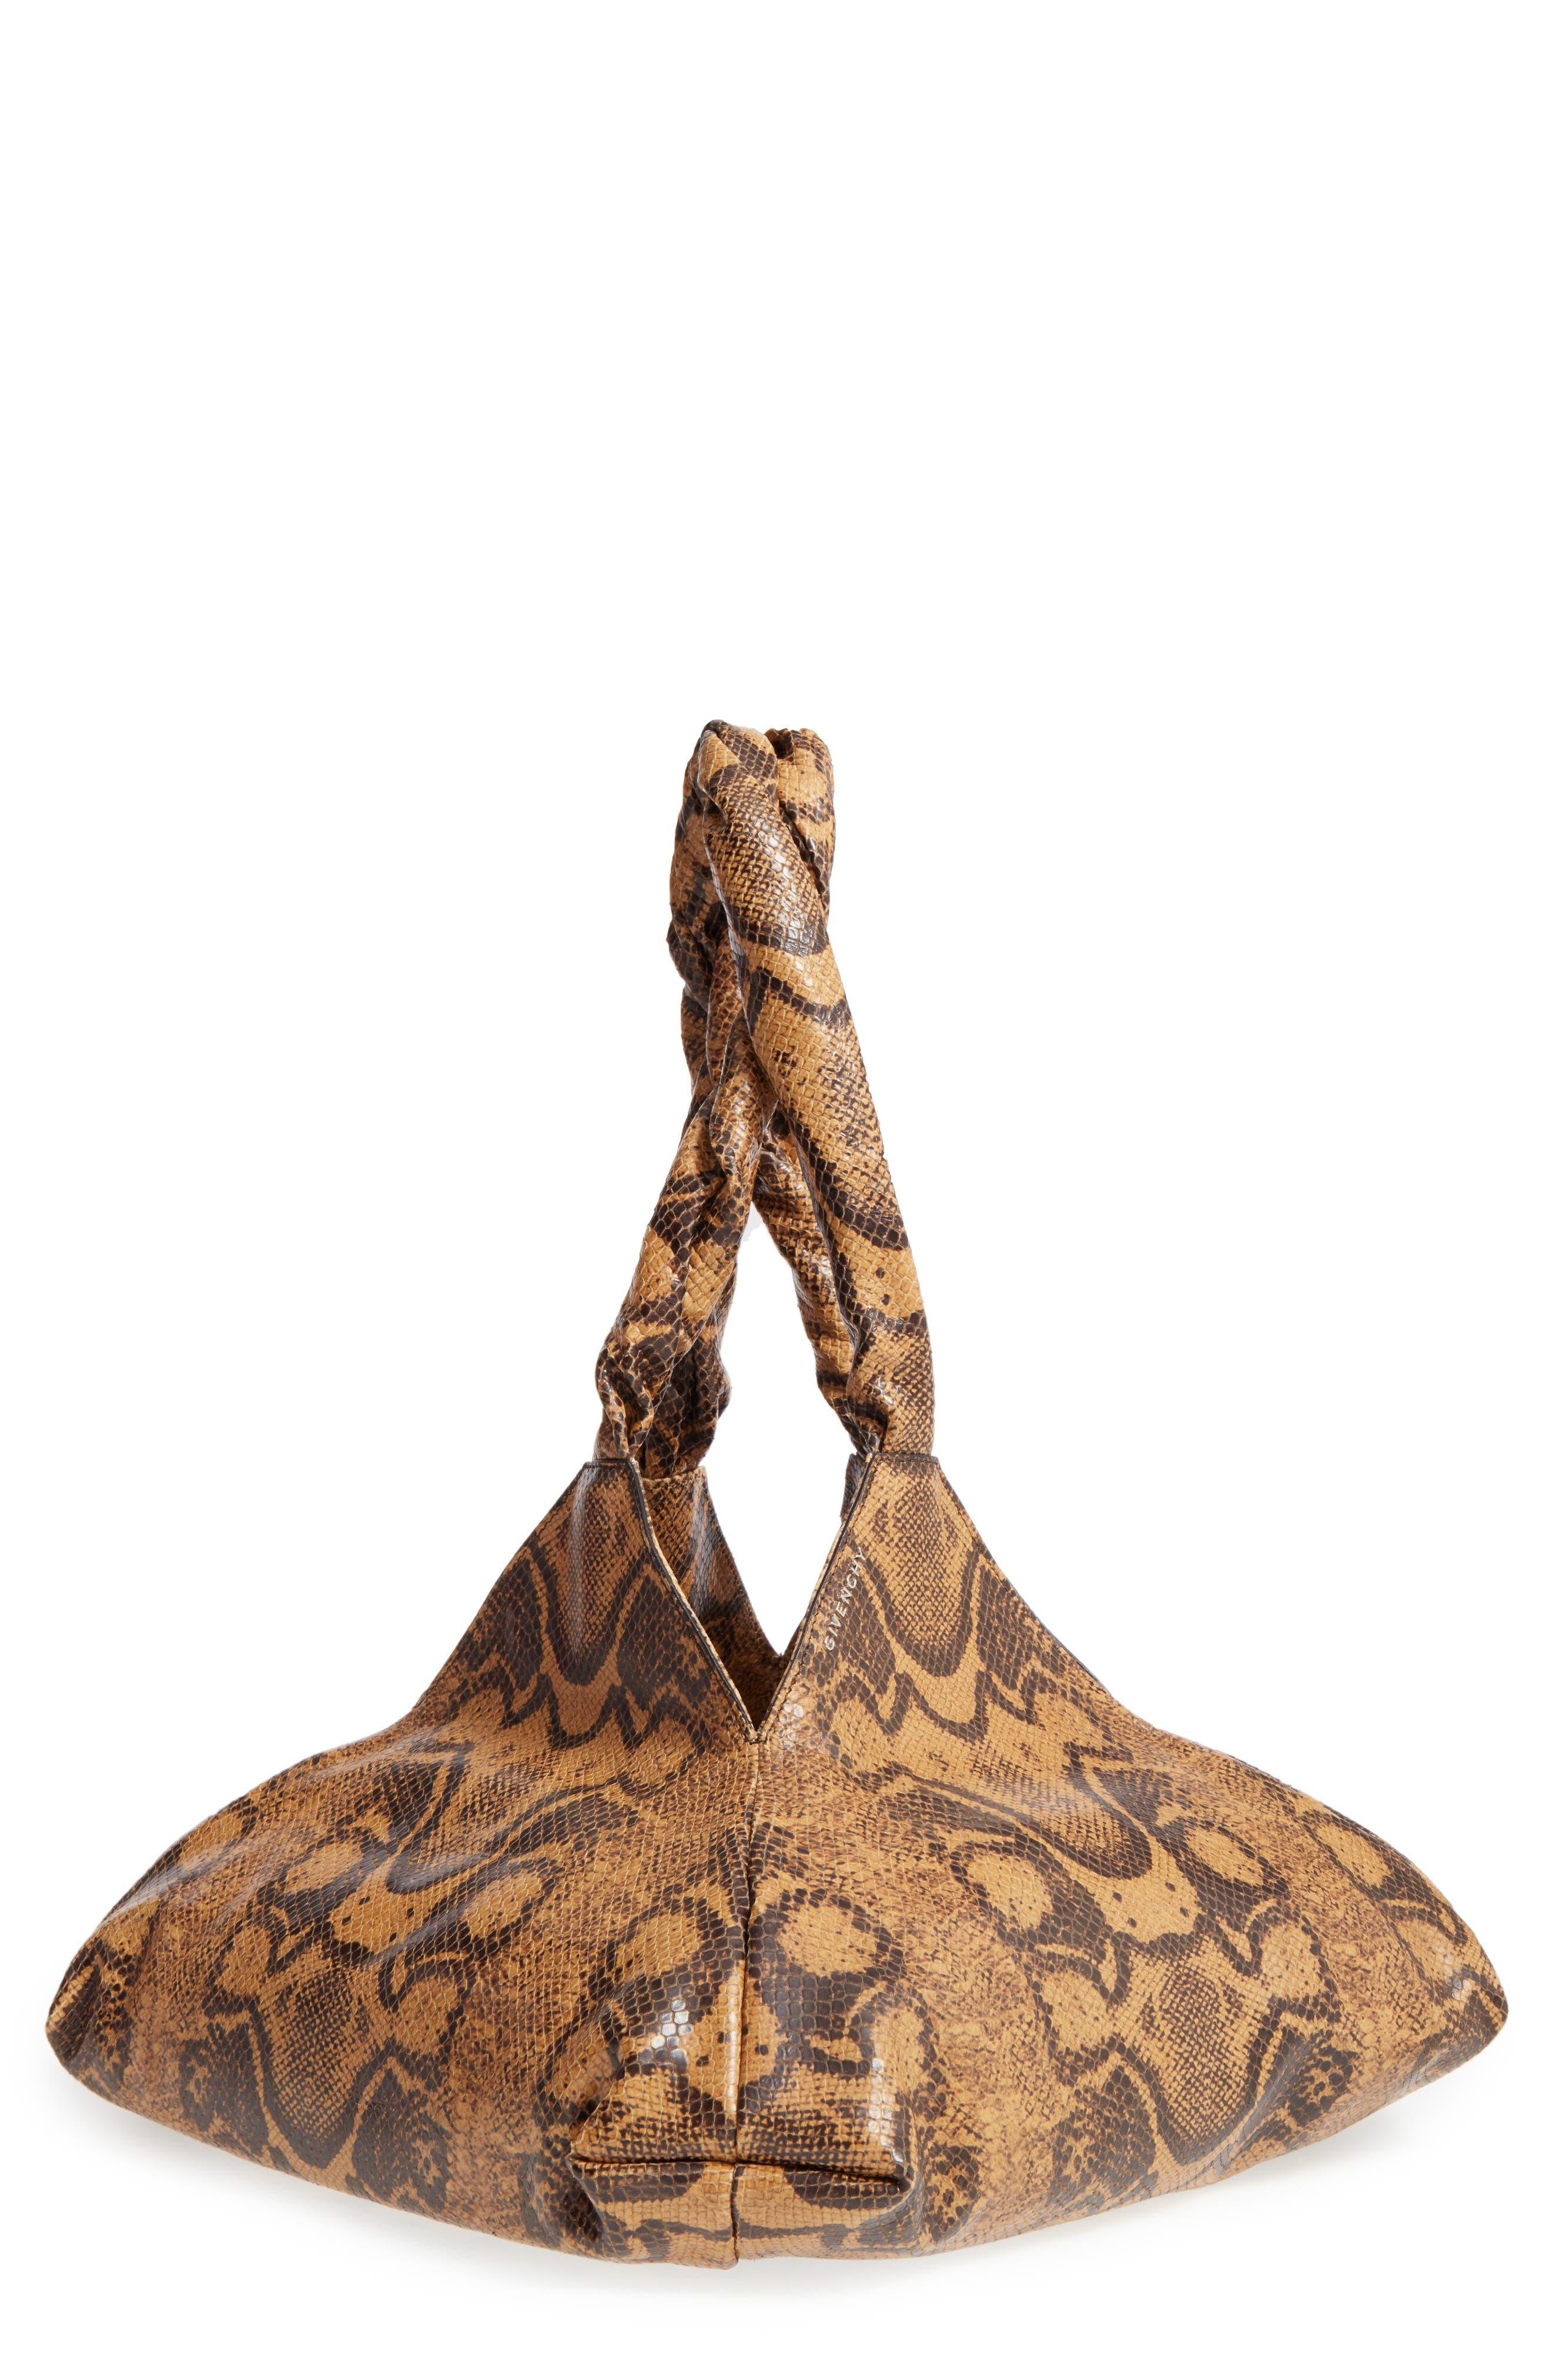 Givenchy Pyramid Leather Shoulder Bag